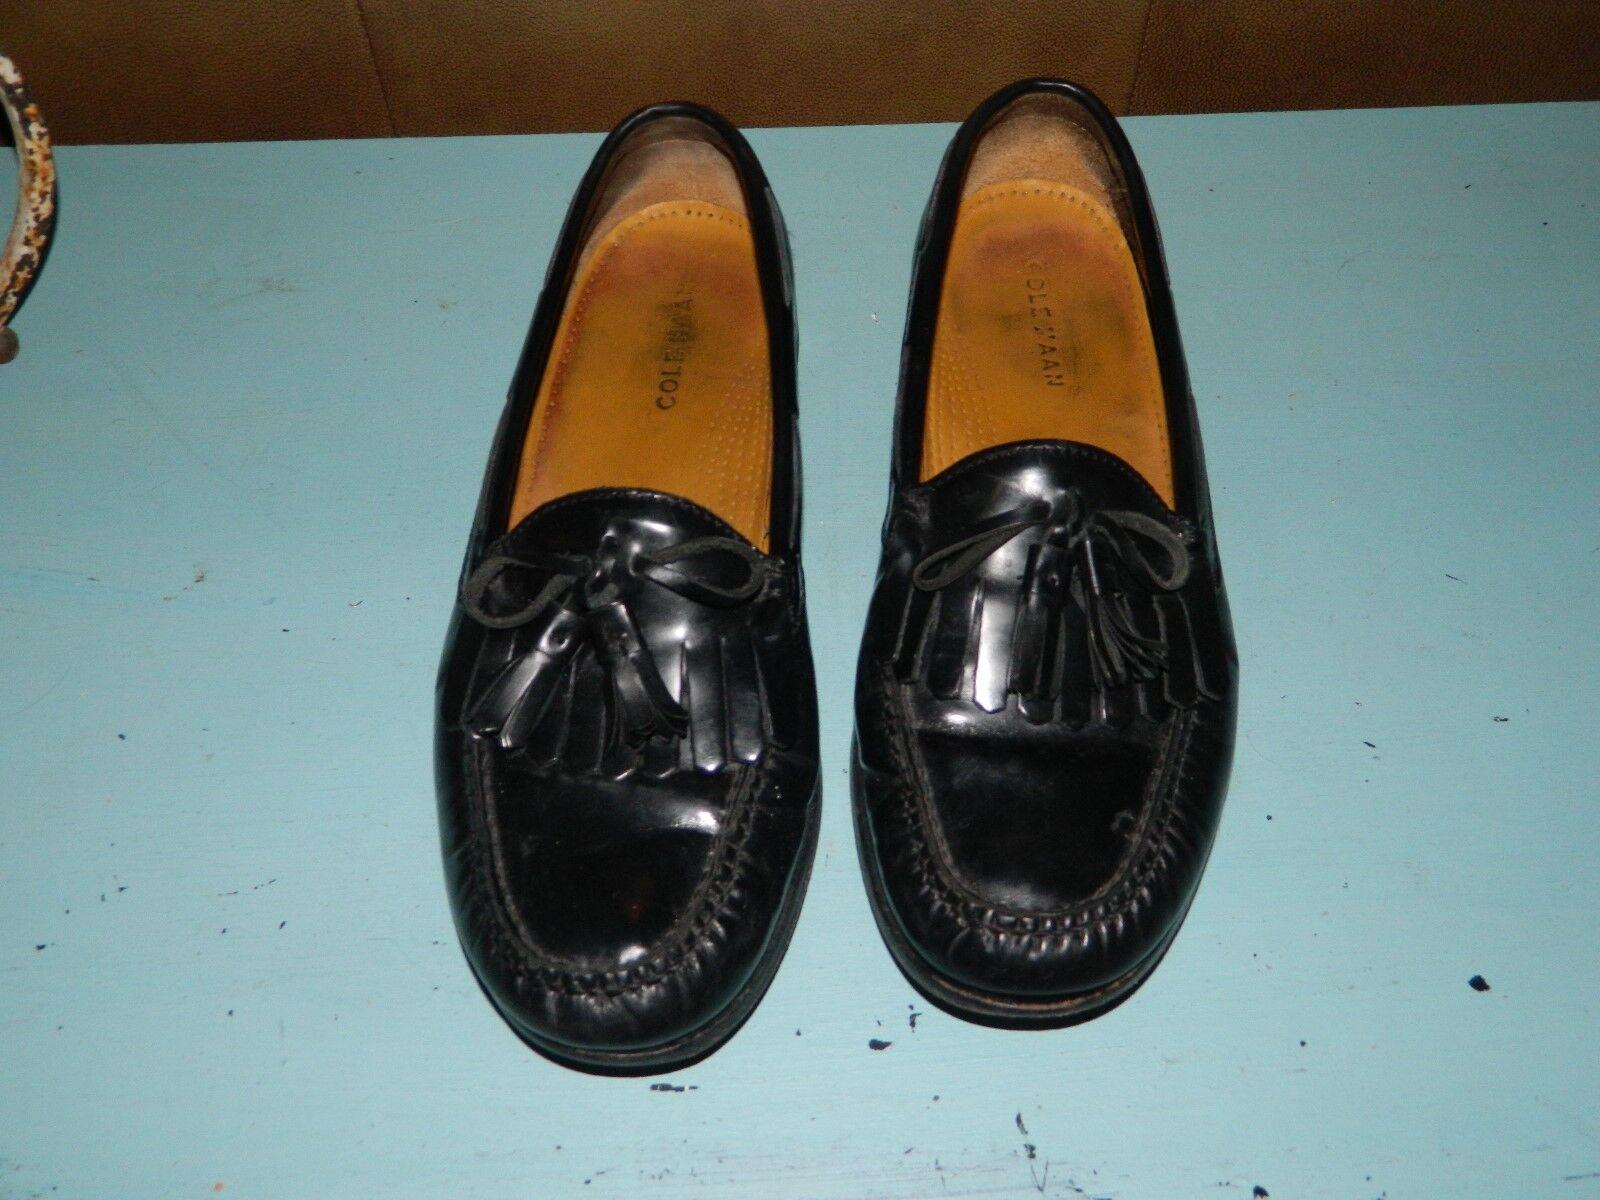 Cole Haan Loafers Pinch Moc Toe Tassel Kiltie Mens Slip On shoes C02691 Size 9D